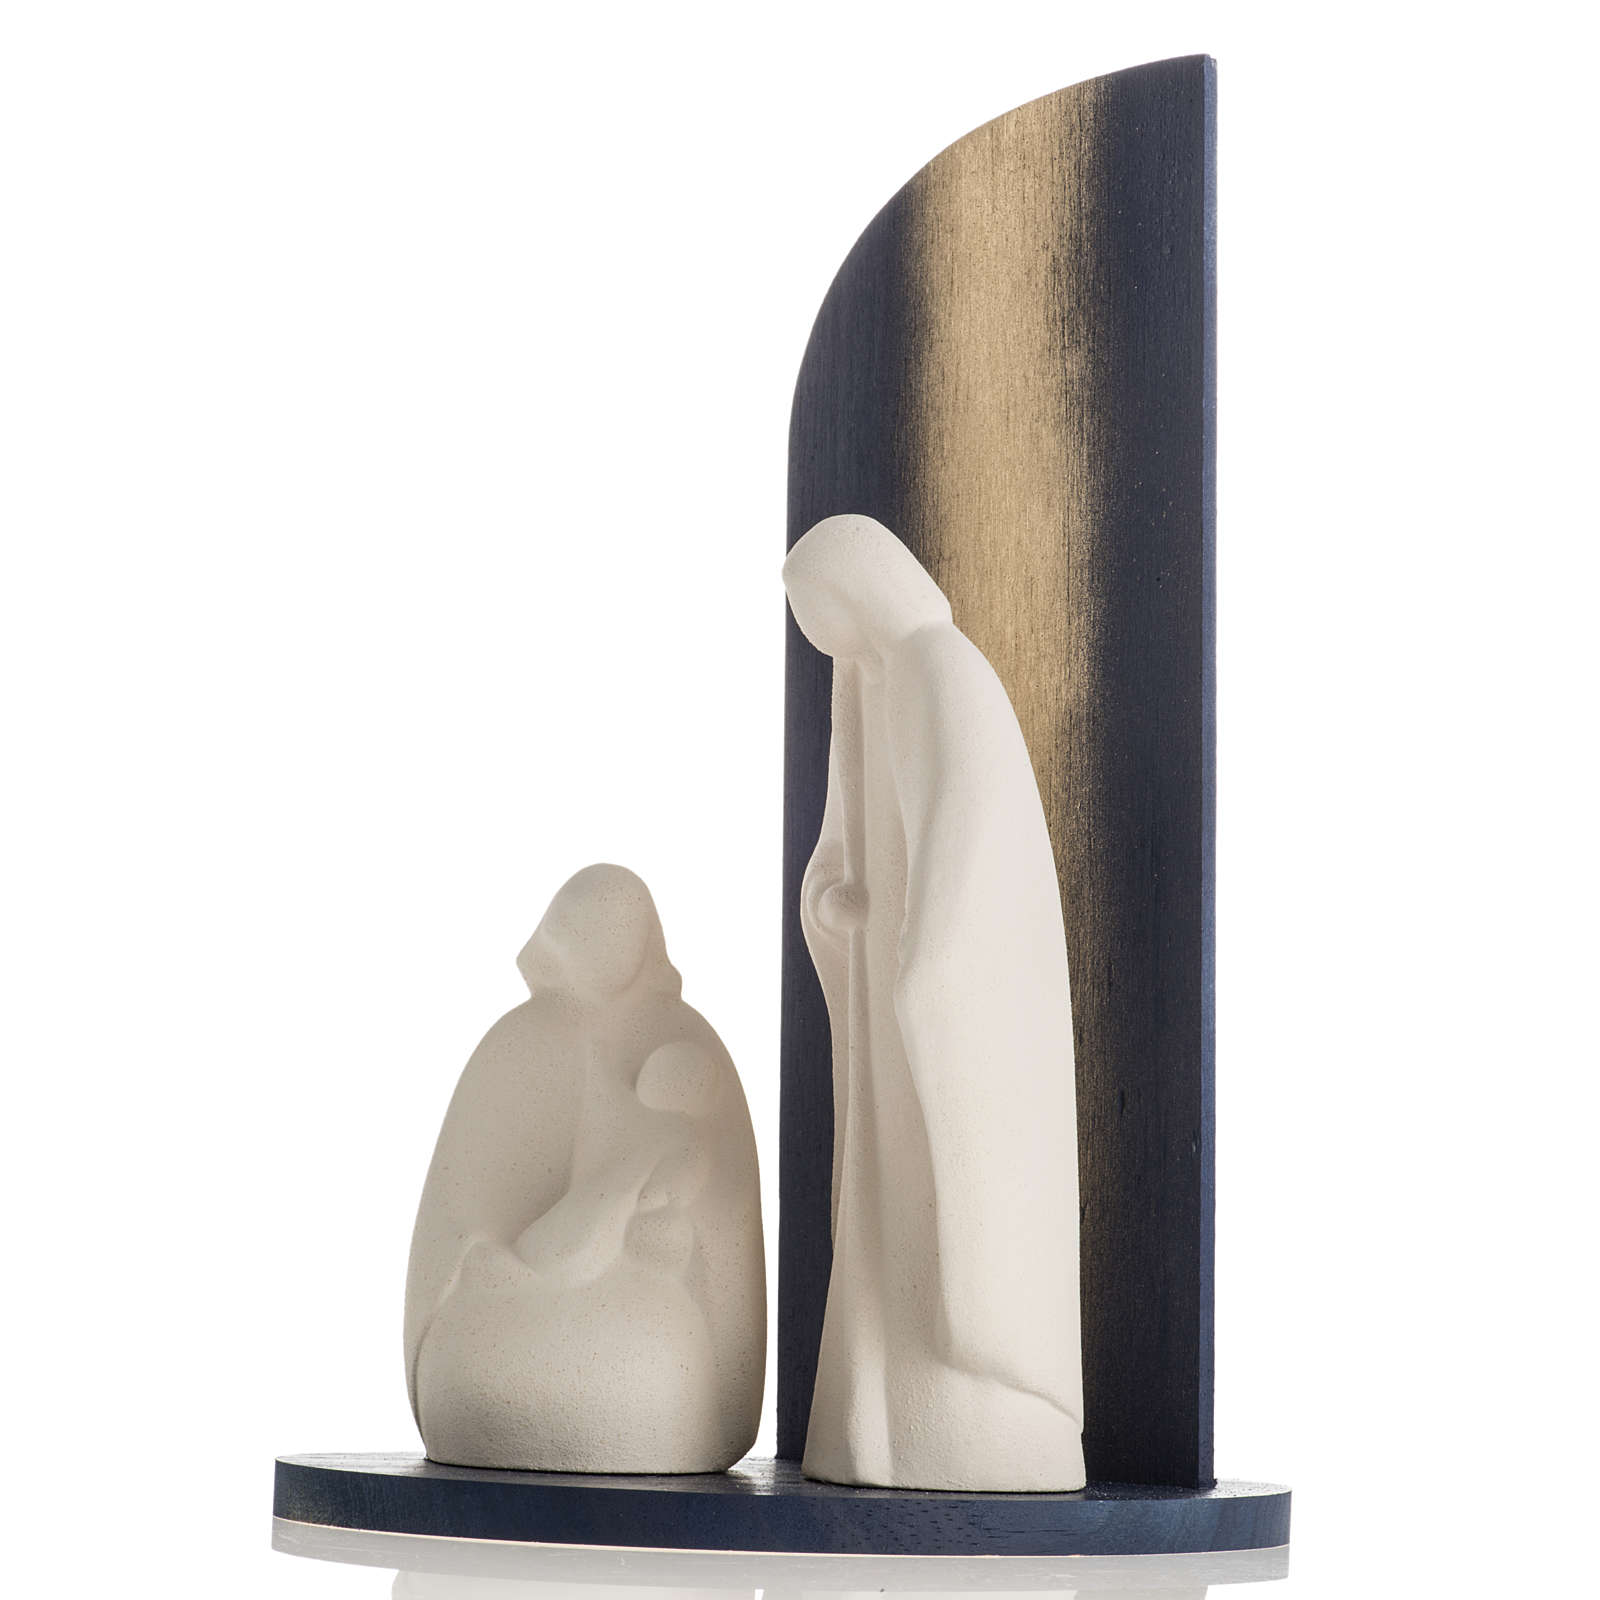 Presepe Noel argilla refrattaria legno gold 28 cm 4